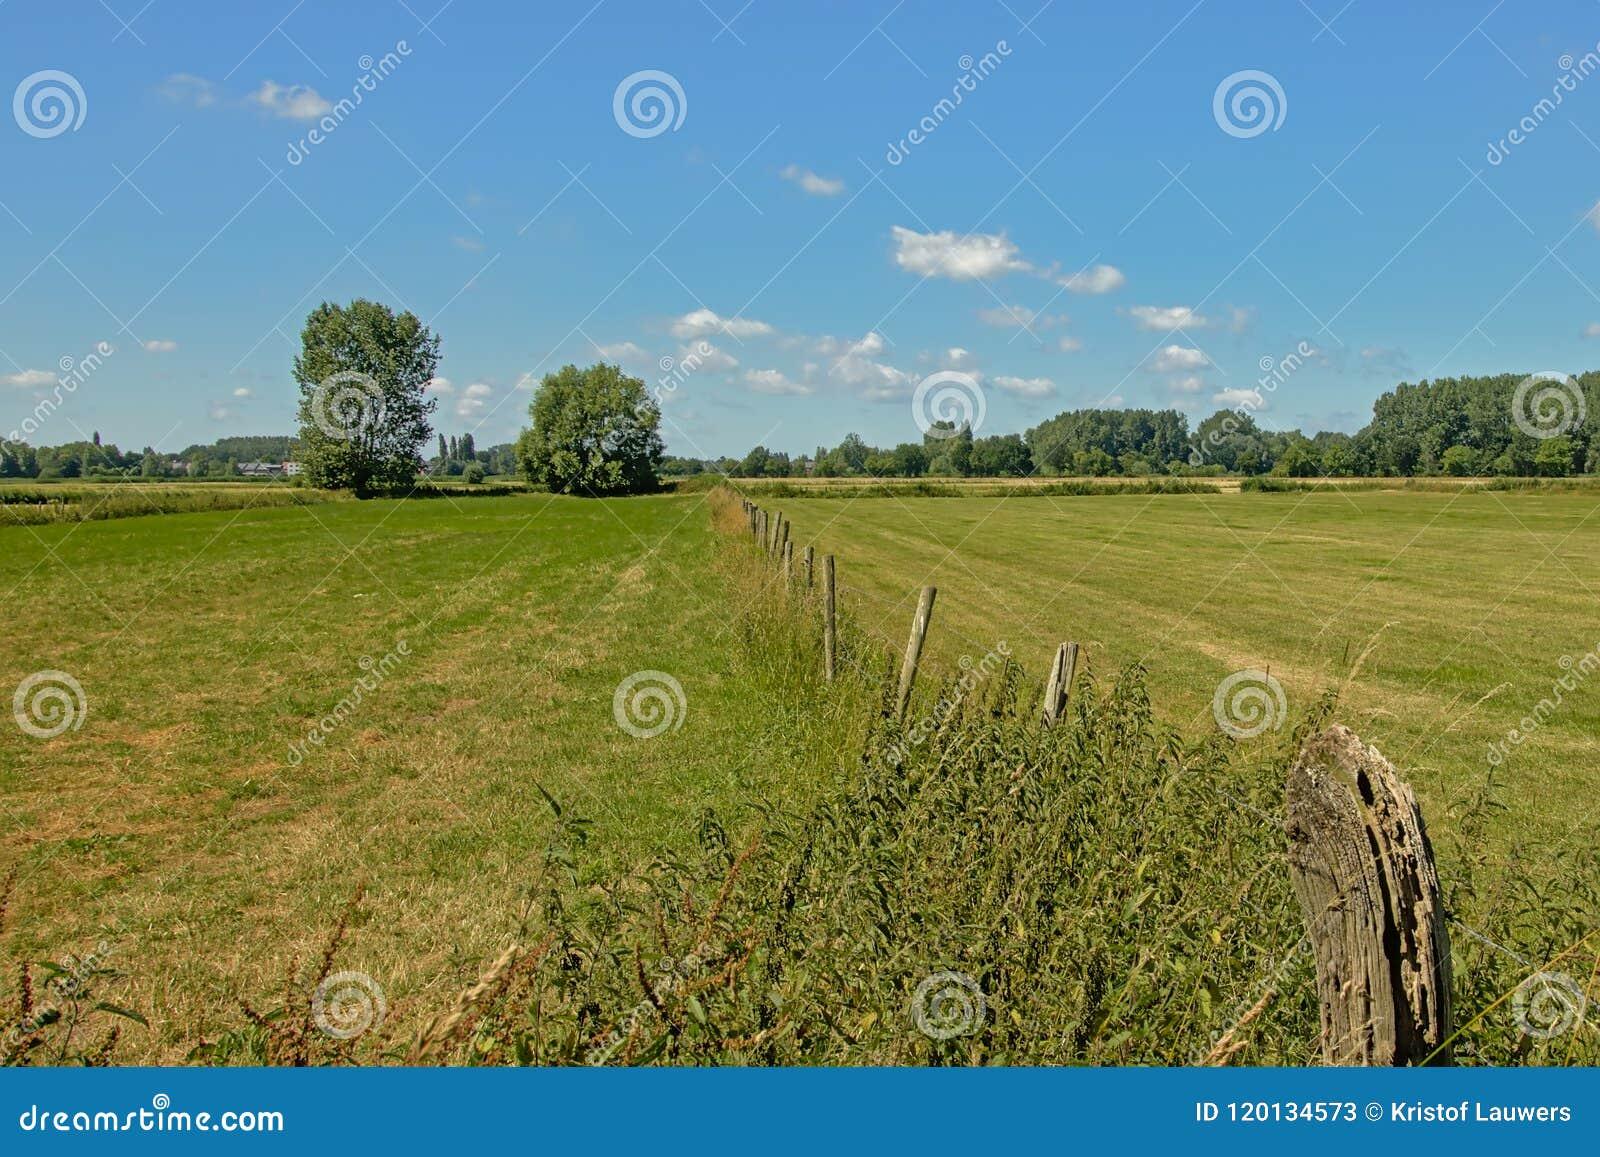 Meadows with trees under a clear blue sky in Kalkense Meersen nature reserve, Flanders, Belgium.